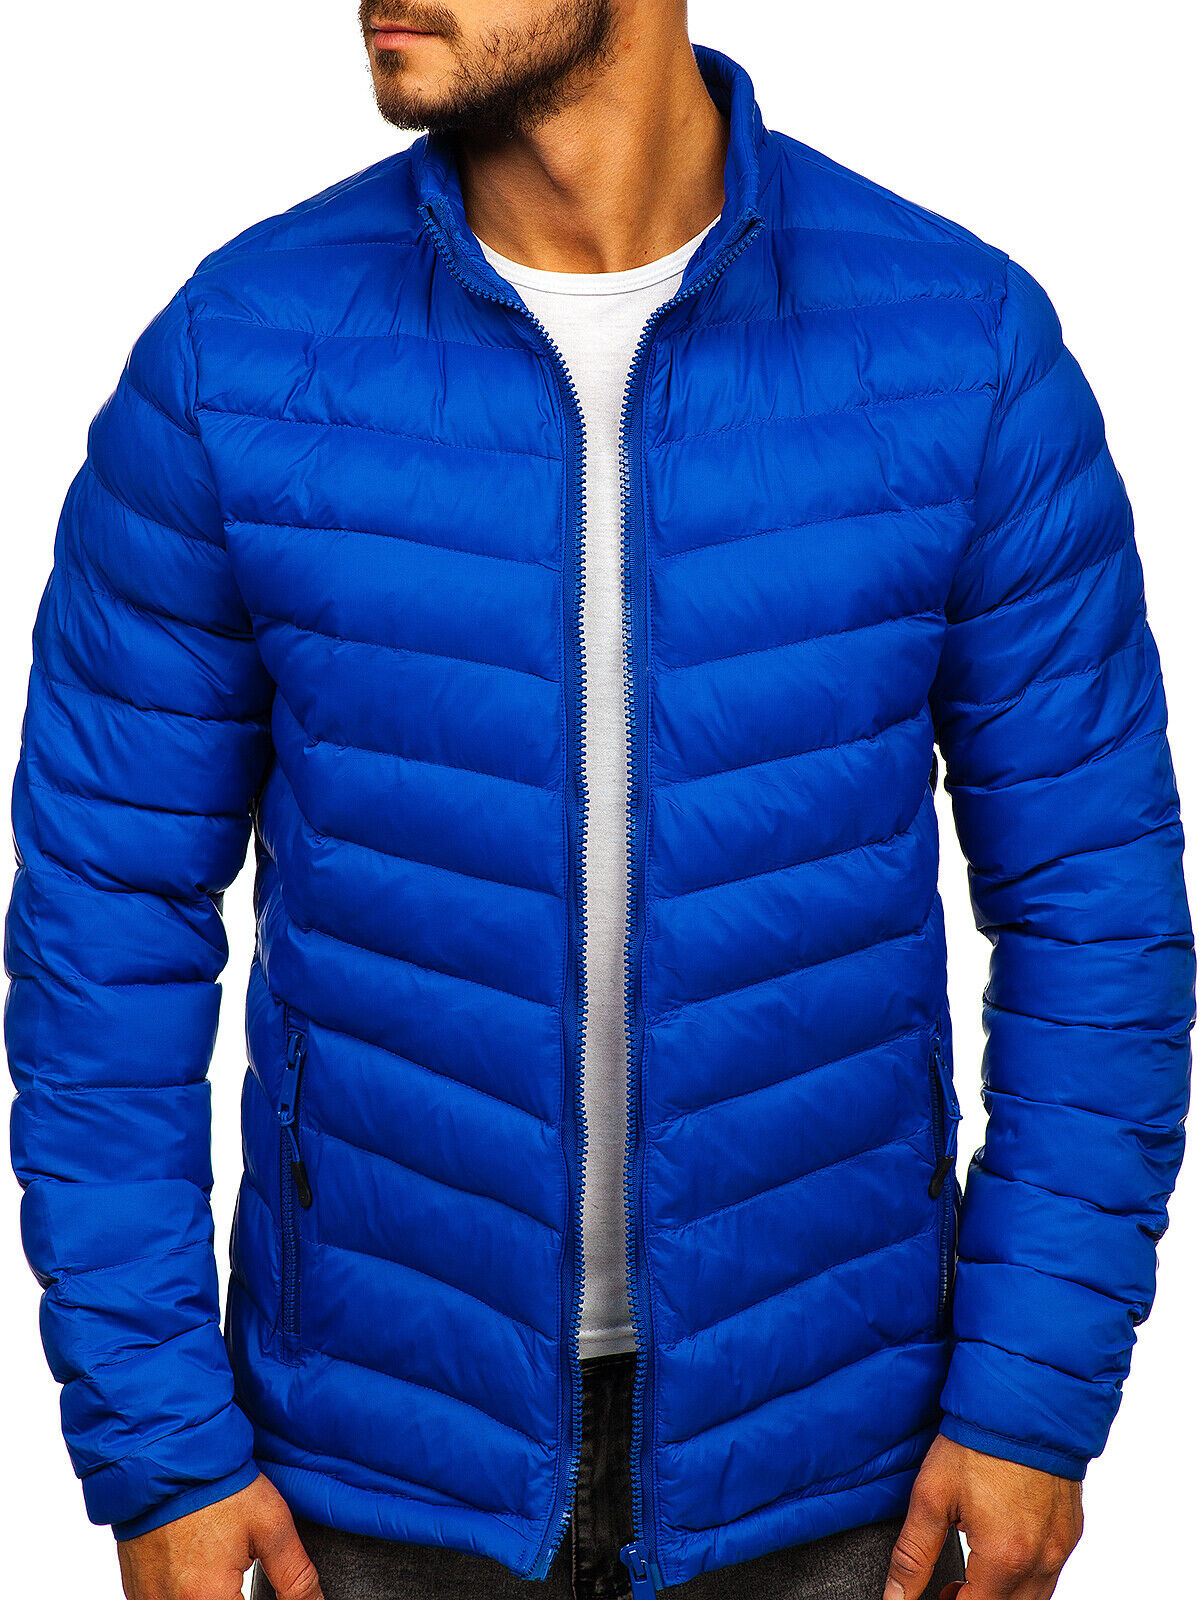 J.Style SM70 Blau